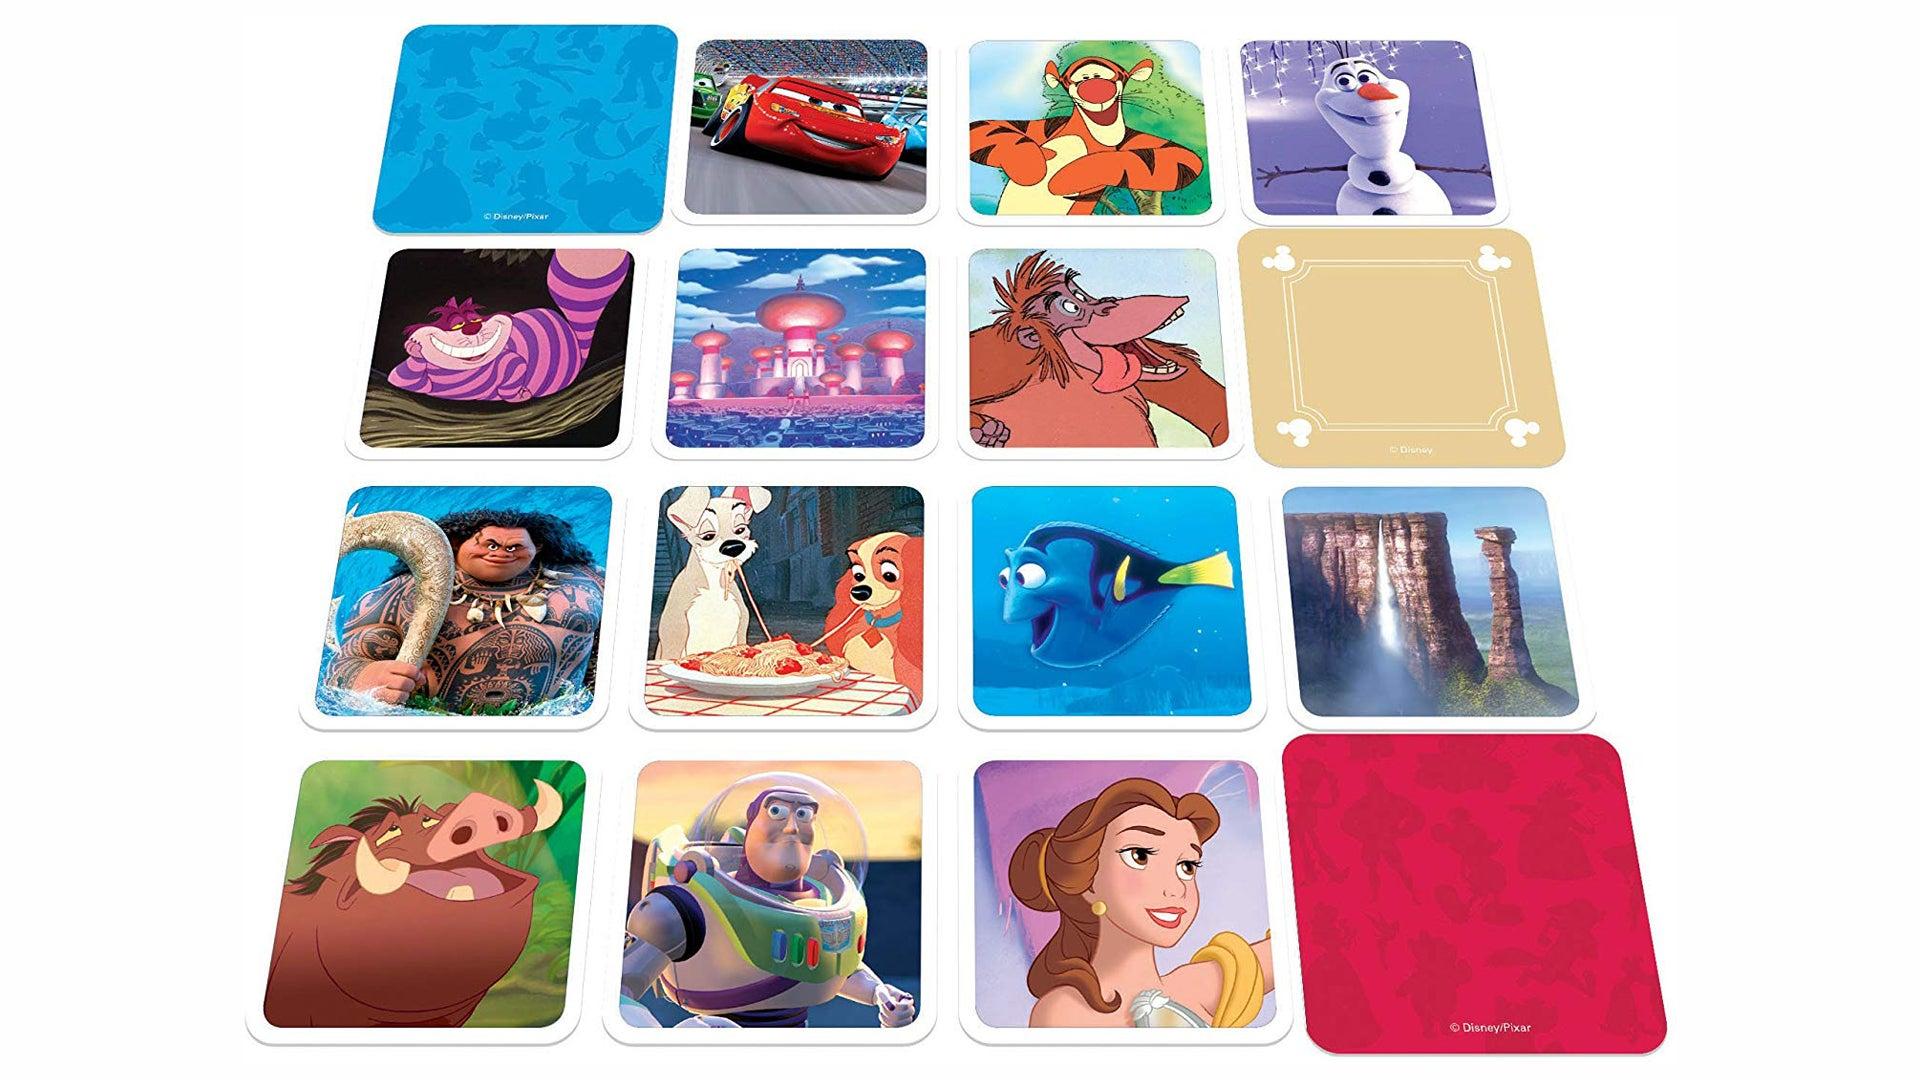 Disney Codenames board game cards